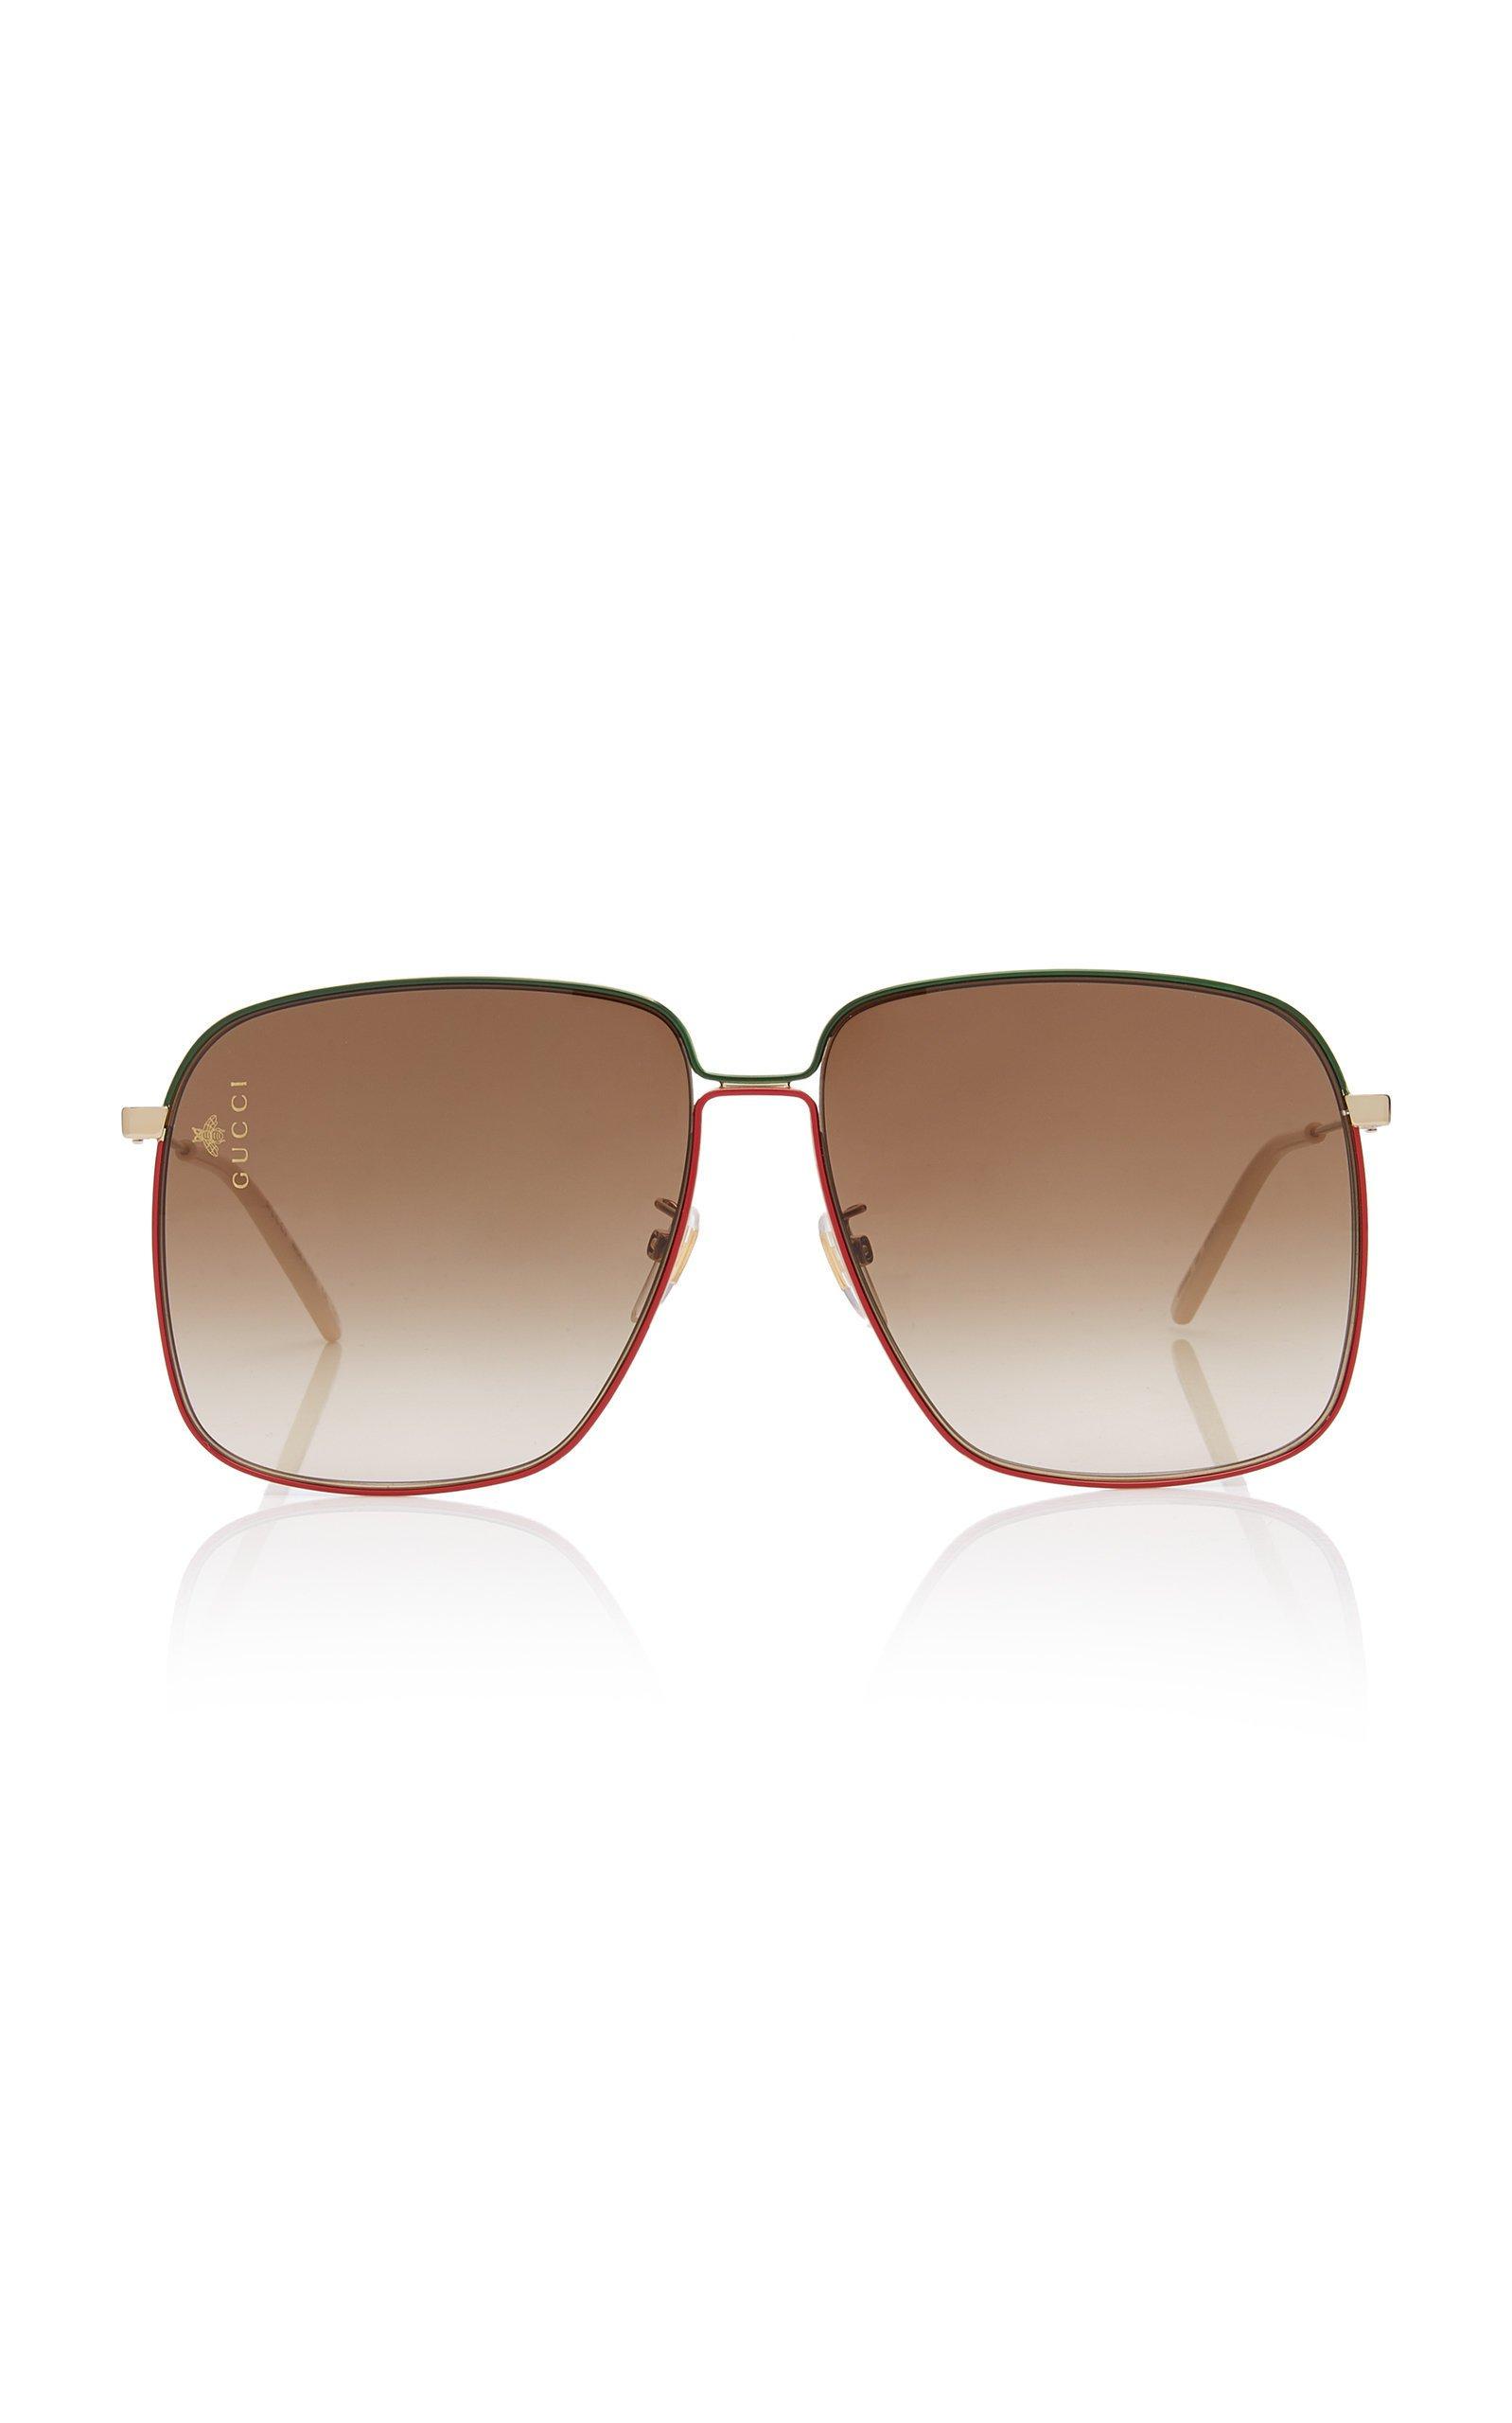 Gucci Glasant Oversized Metal Square-Frame Sunglasses